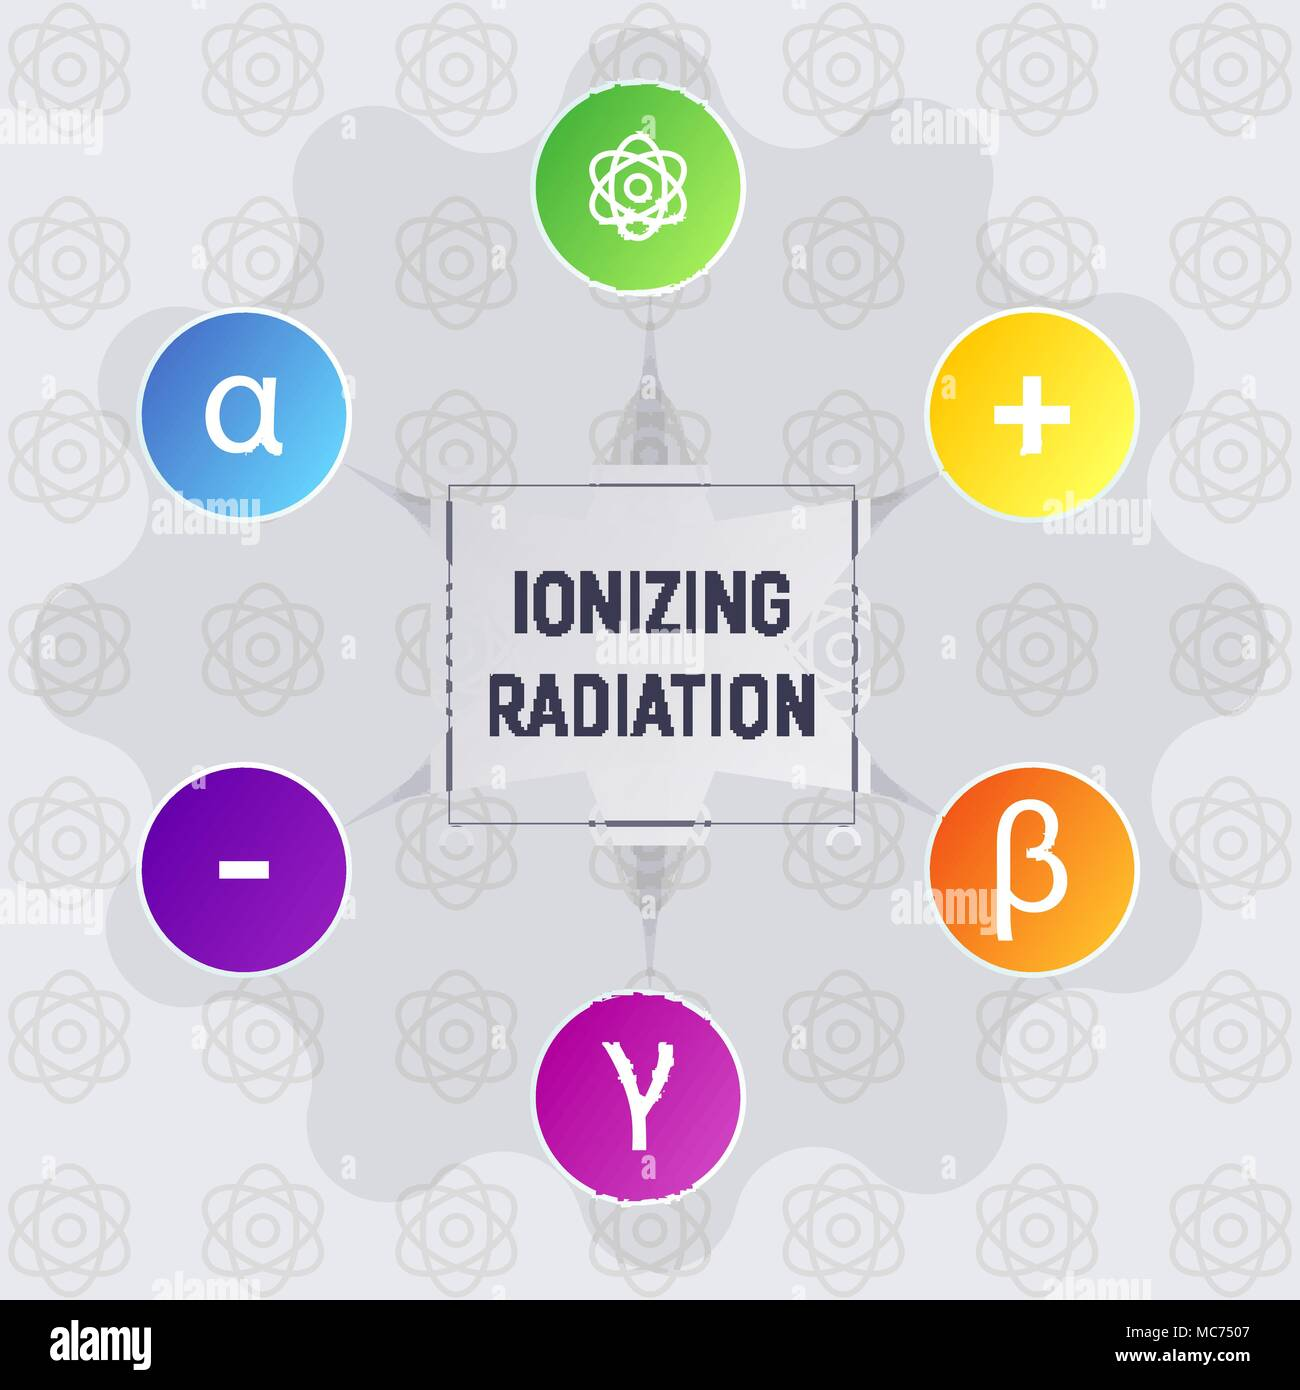 Ionizing radiation - Stock Vector